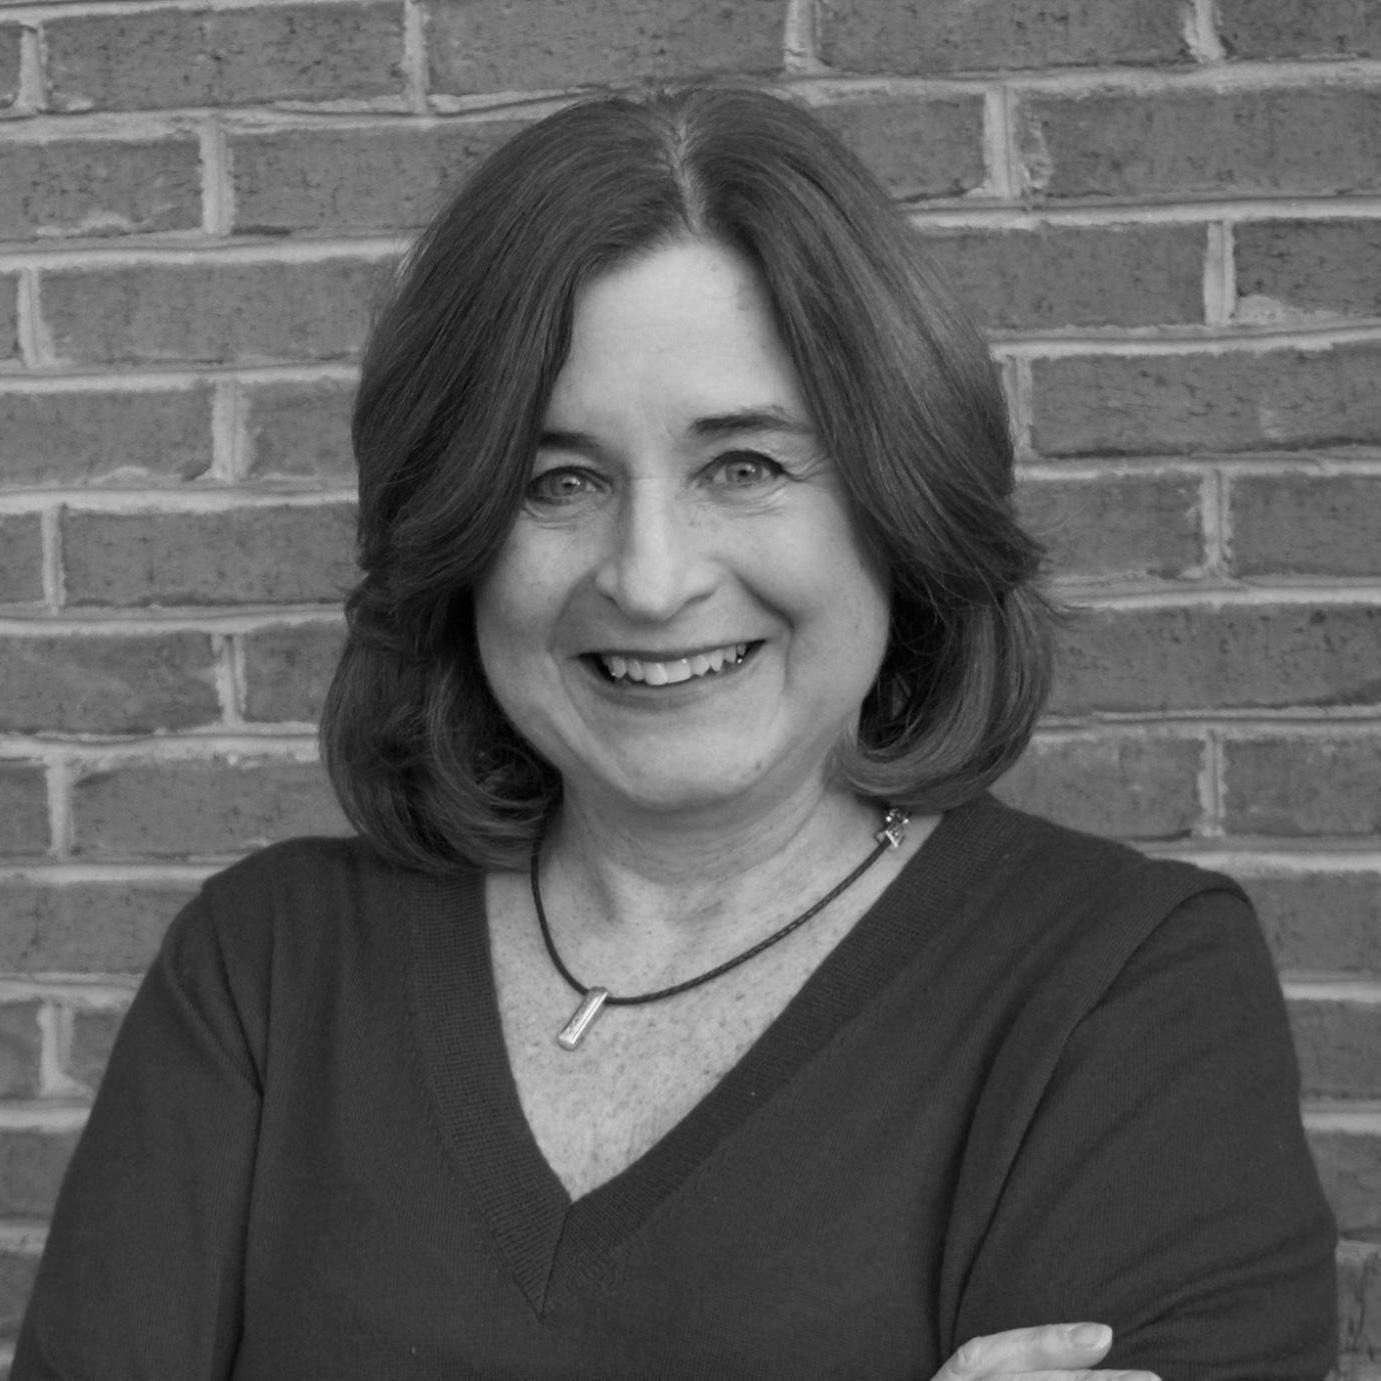 Lisa Flanary, Founder